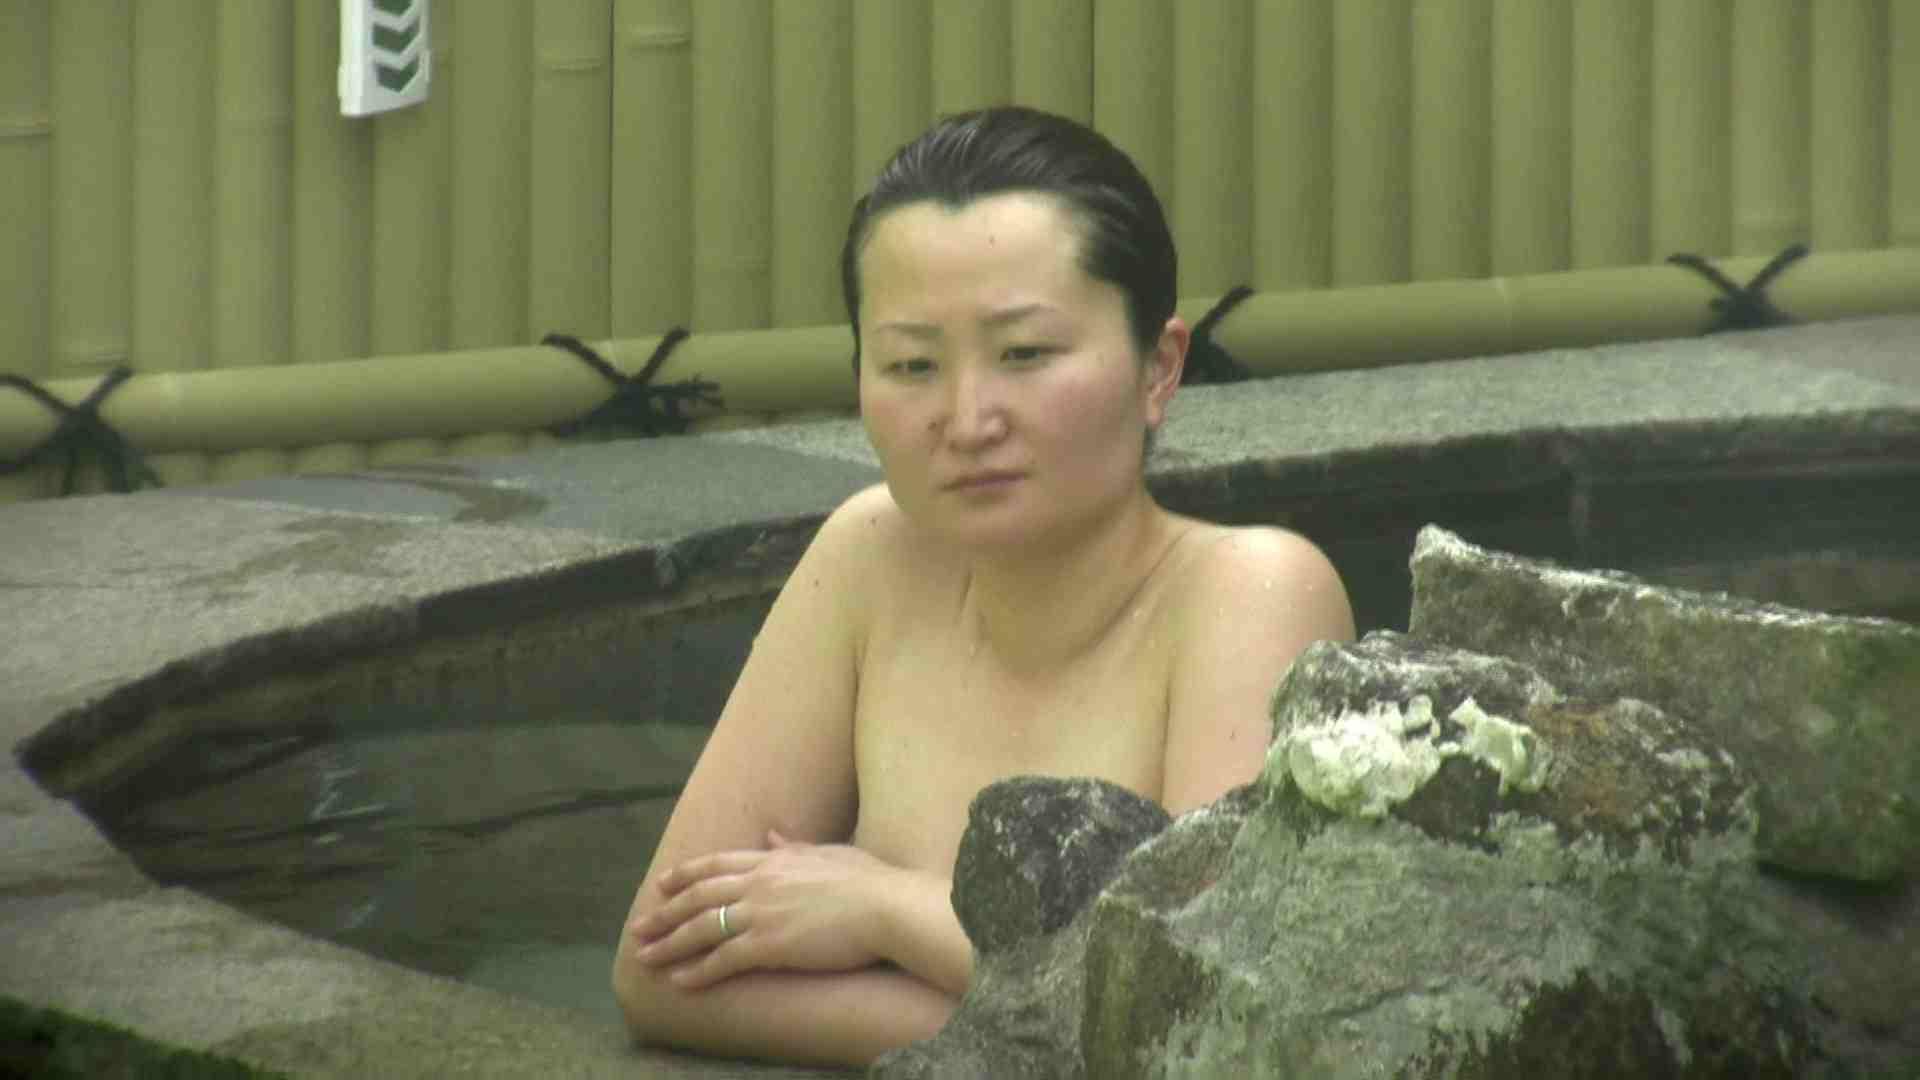 Aquaな露天風呂Vol.632 露天 戯れ無修正画像 70画像 65